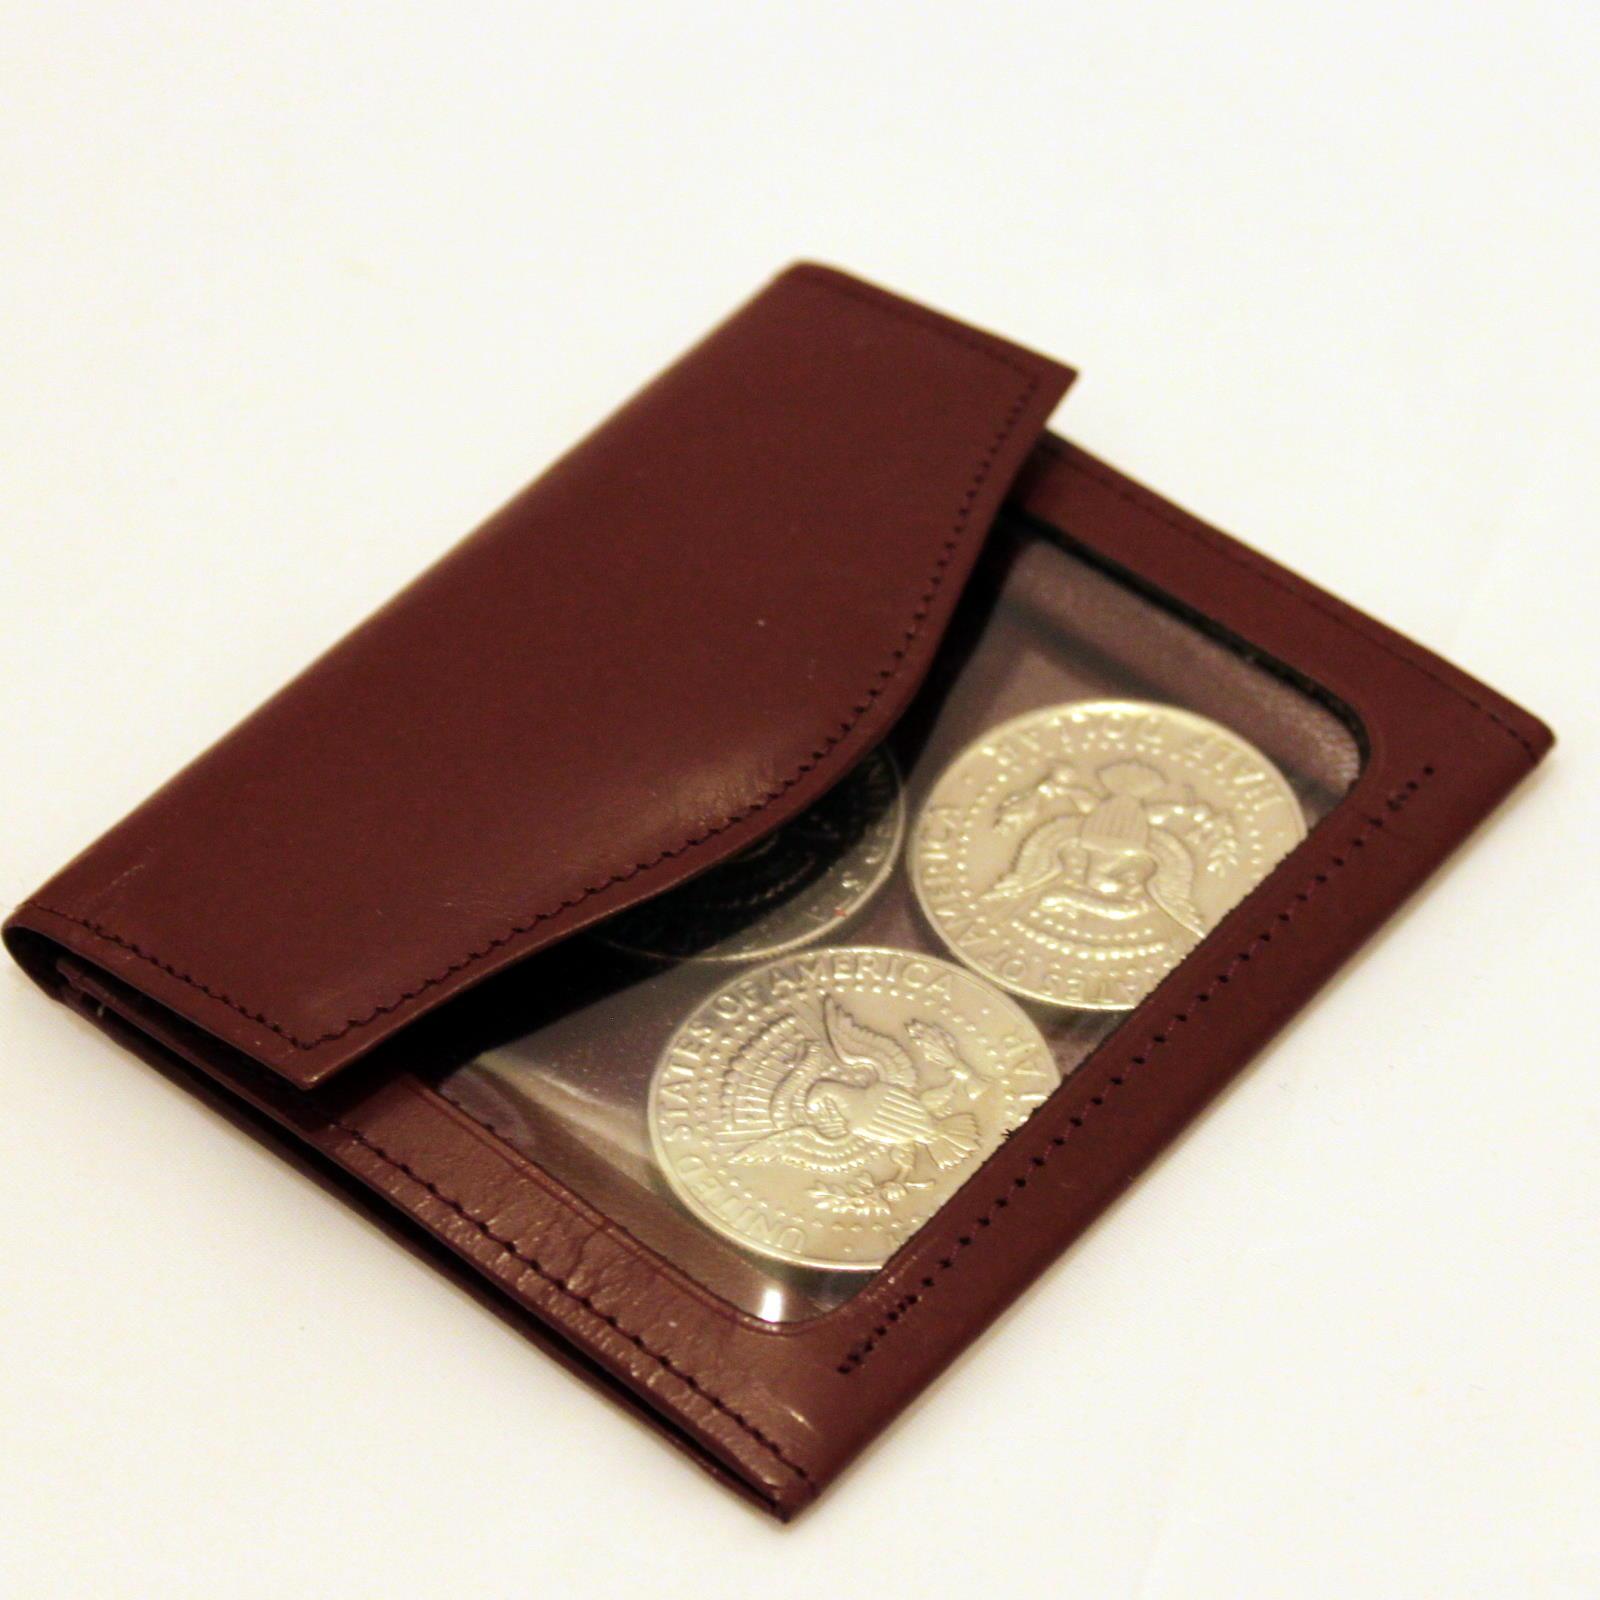 Japanese Coin Purse by Howard Schwarzman